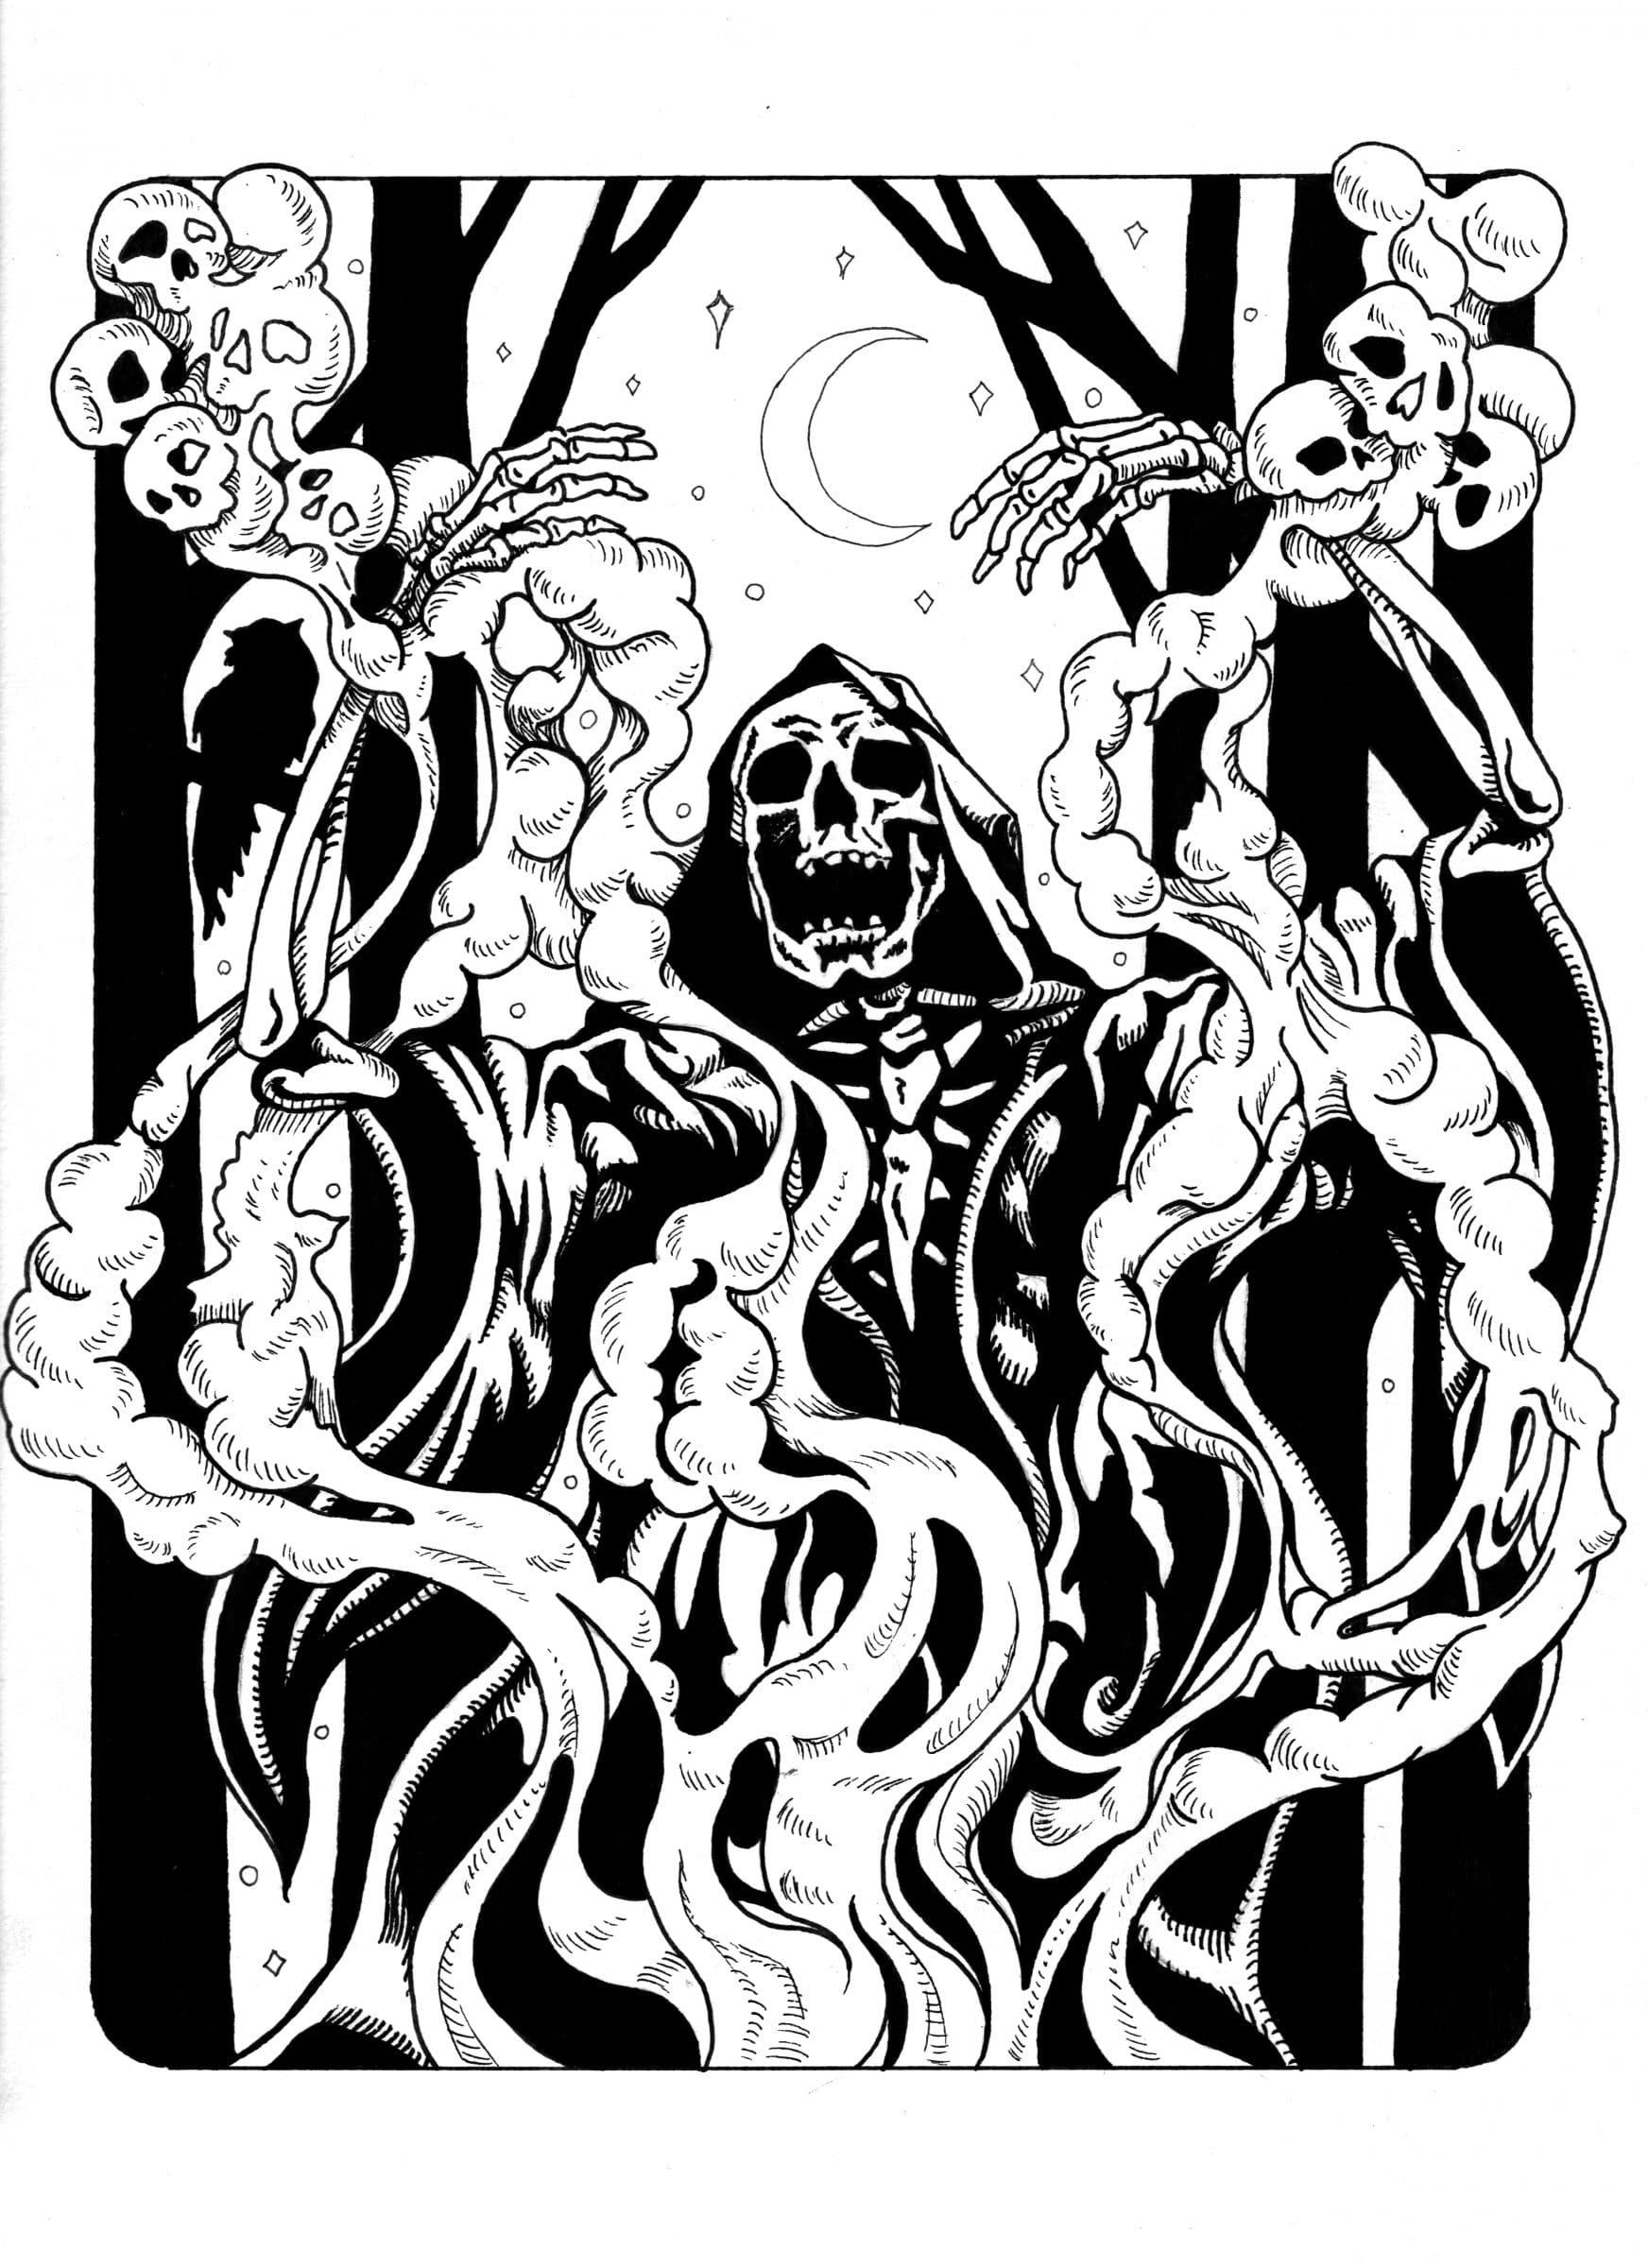 Skeleton Wizard Conjuring Spirits in Smoke - Ink Drawing by Rebecca Magar